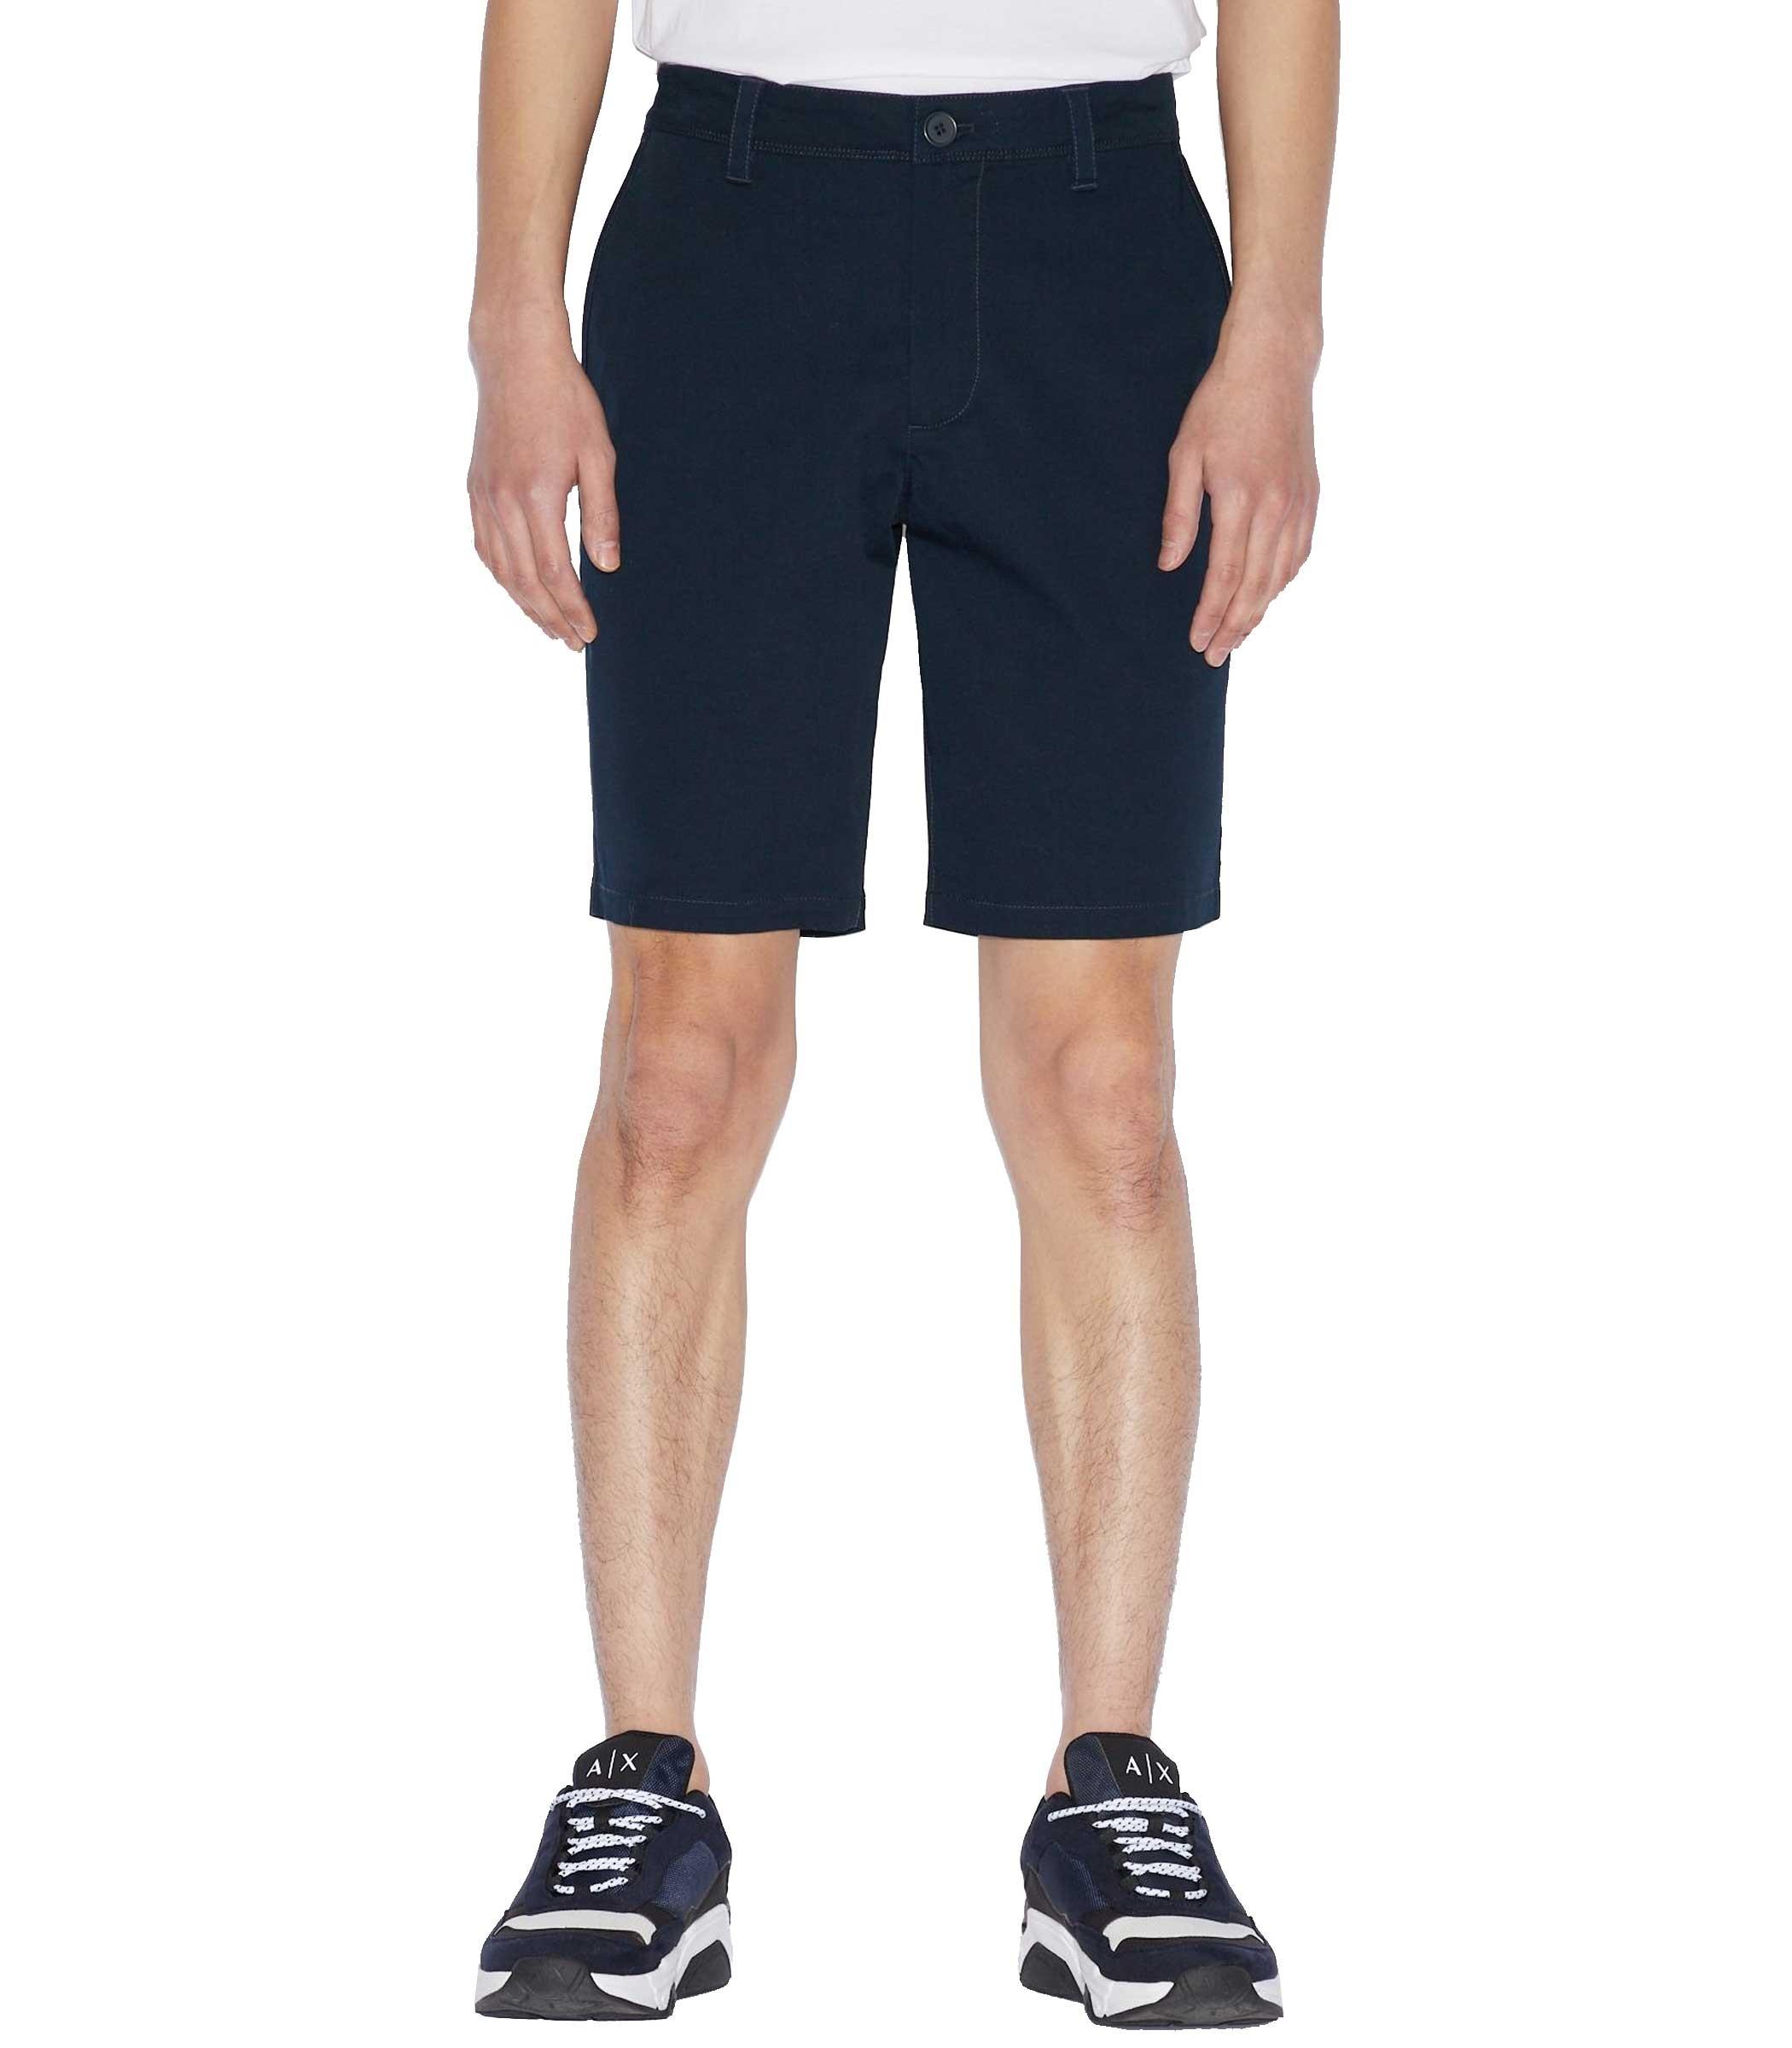 60973ca1972b Bermuda shorts Armani Exchange da uomo rif. 8NZS42 ZN24Z